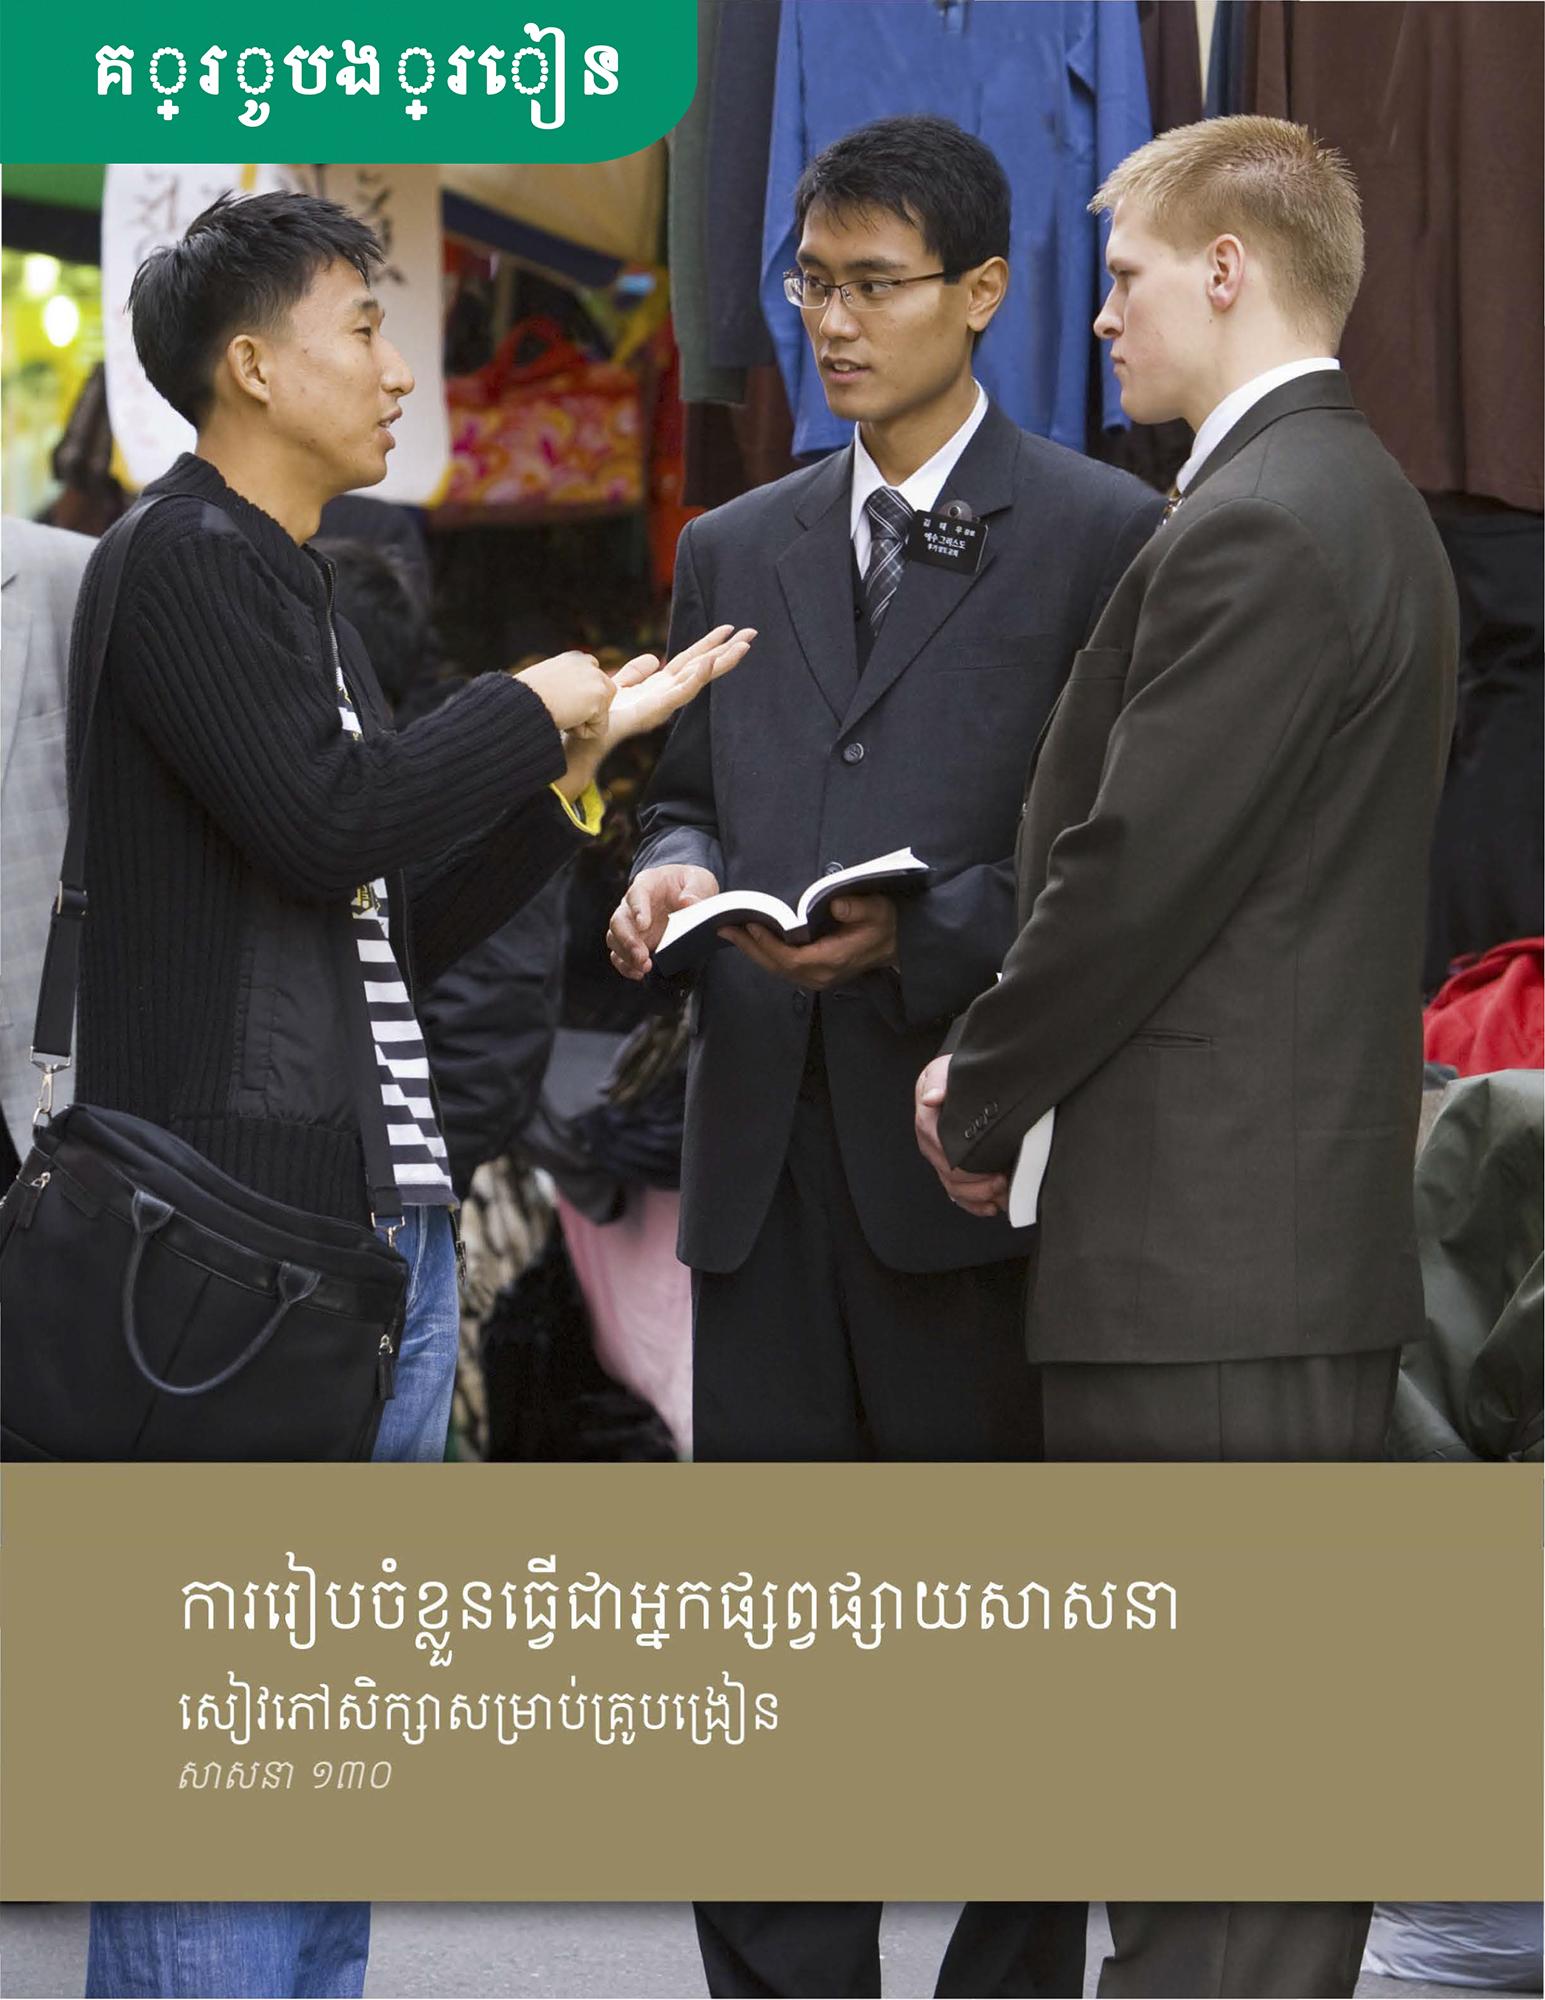 Missionary Preparation Teacher Manual (Religion 130) (សៀវភៅសិក្សាសម្រាប់គ្រូបង្រៀន ស្ដីពីការរៀបចំខ្លួនធ្វើជាអ្នកផ្សព្វផ្សាយសាសនា (សាសនា ១៣០)